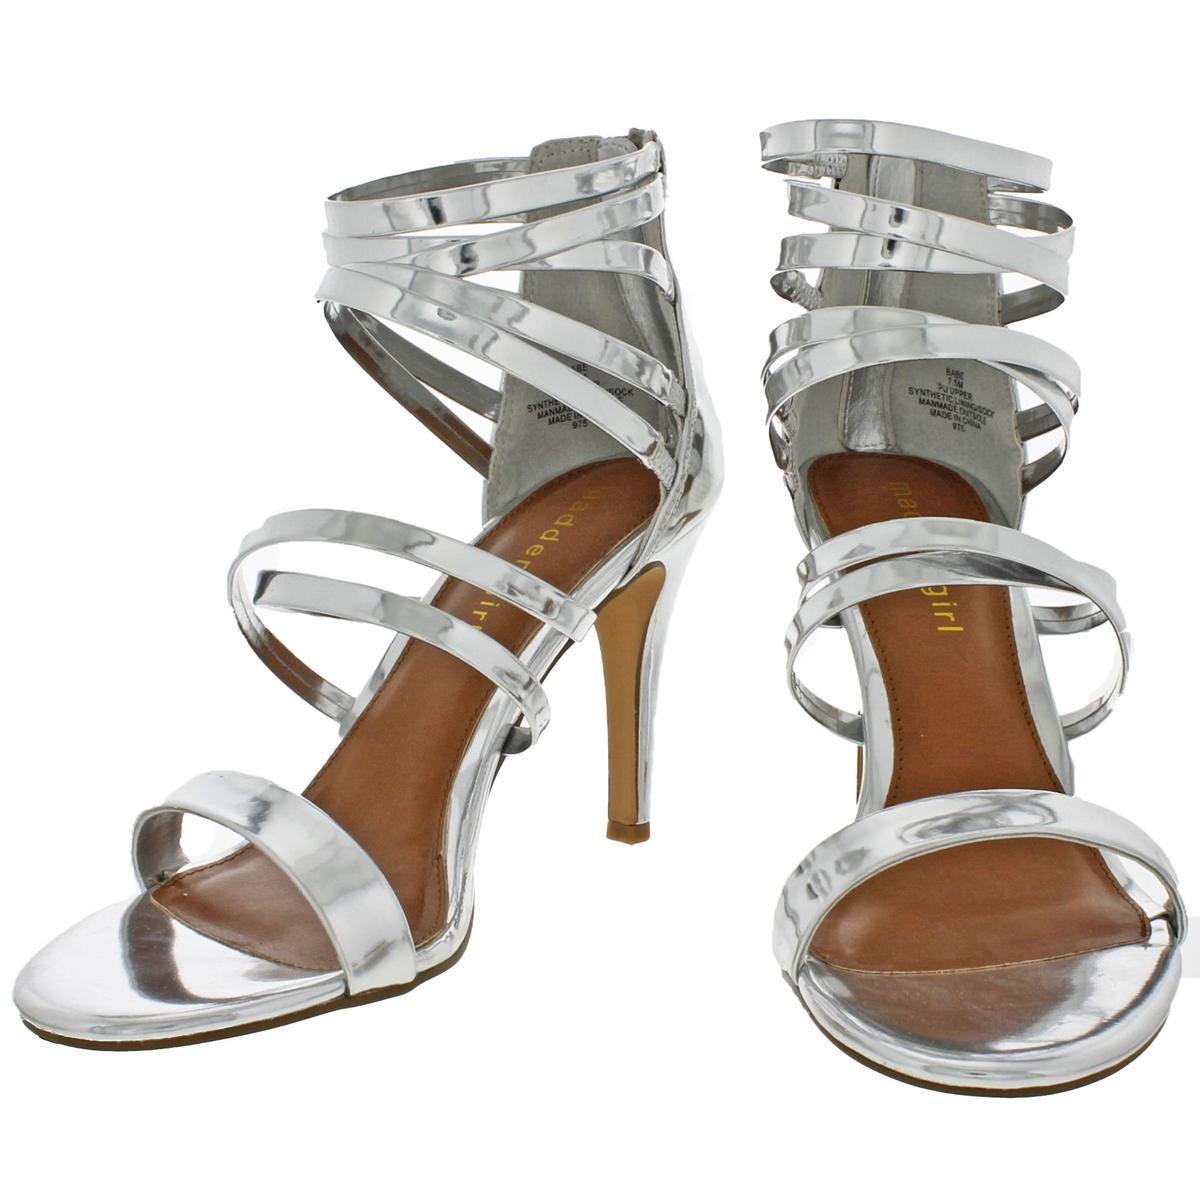 Madden-Girl-by-Steve-Madden-Womens-Babe-Metallic-Strappy-Sandals-Heels-BHFO-9082 thumbnail 6